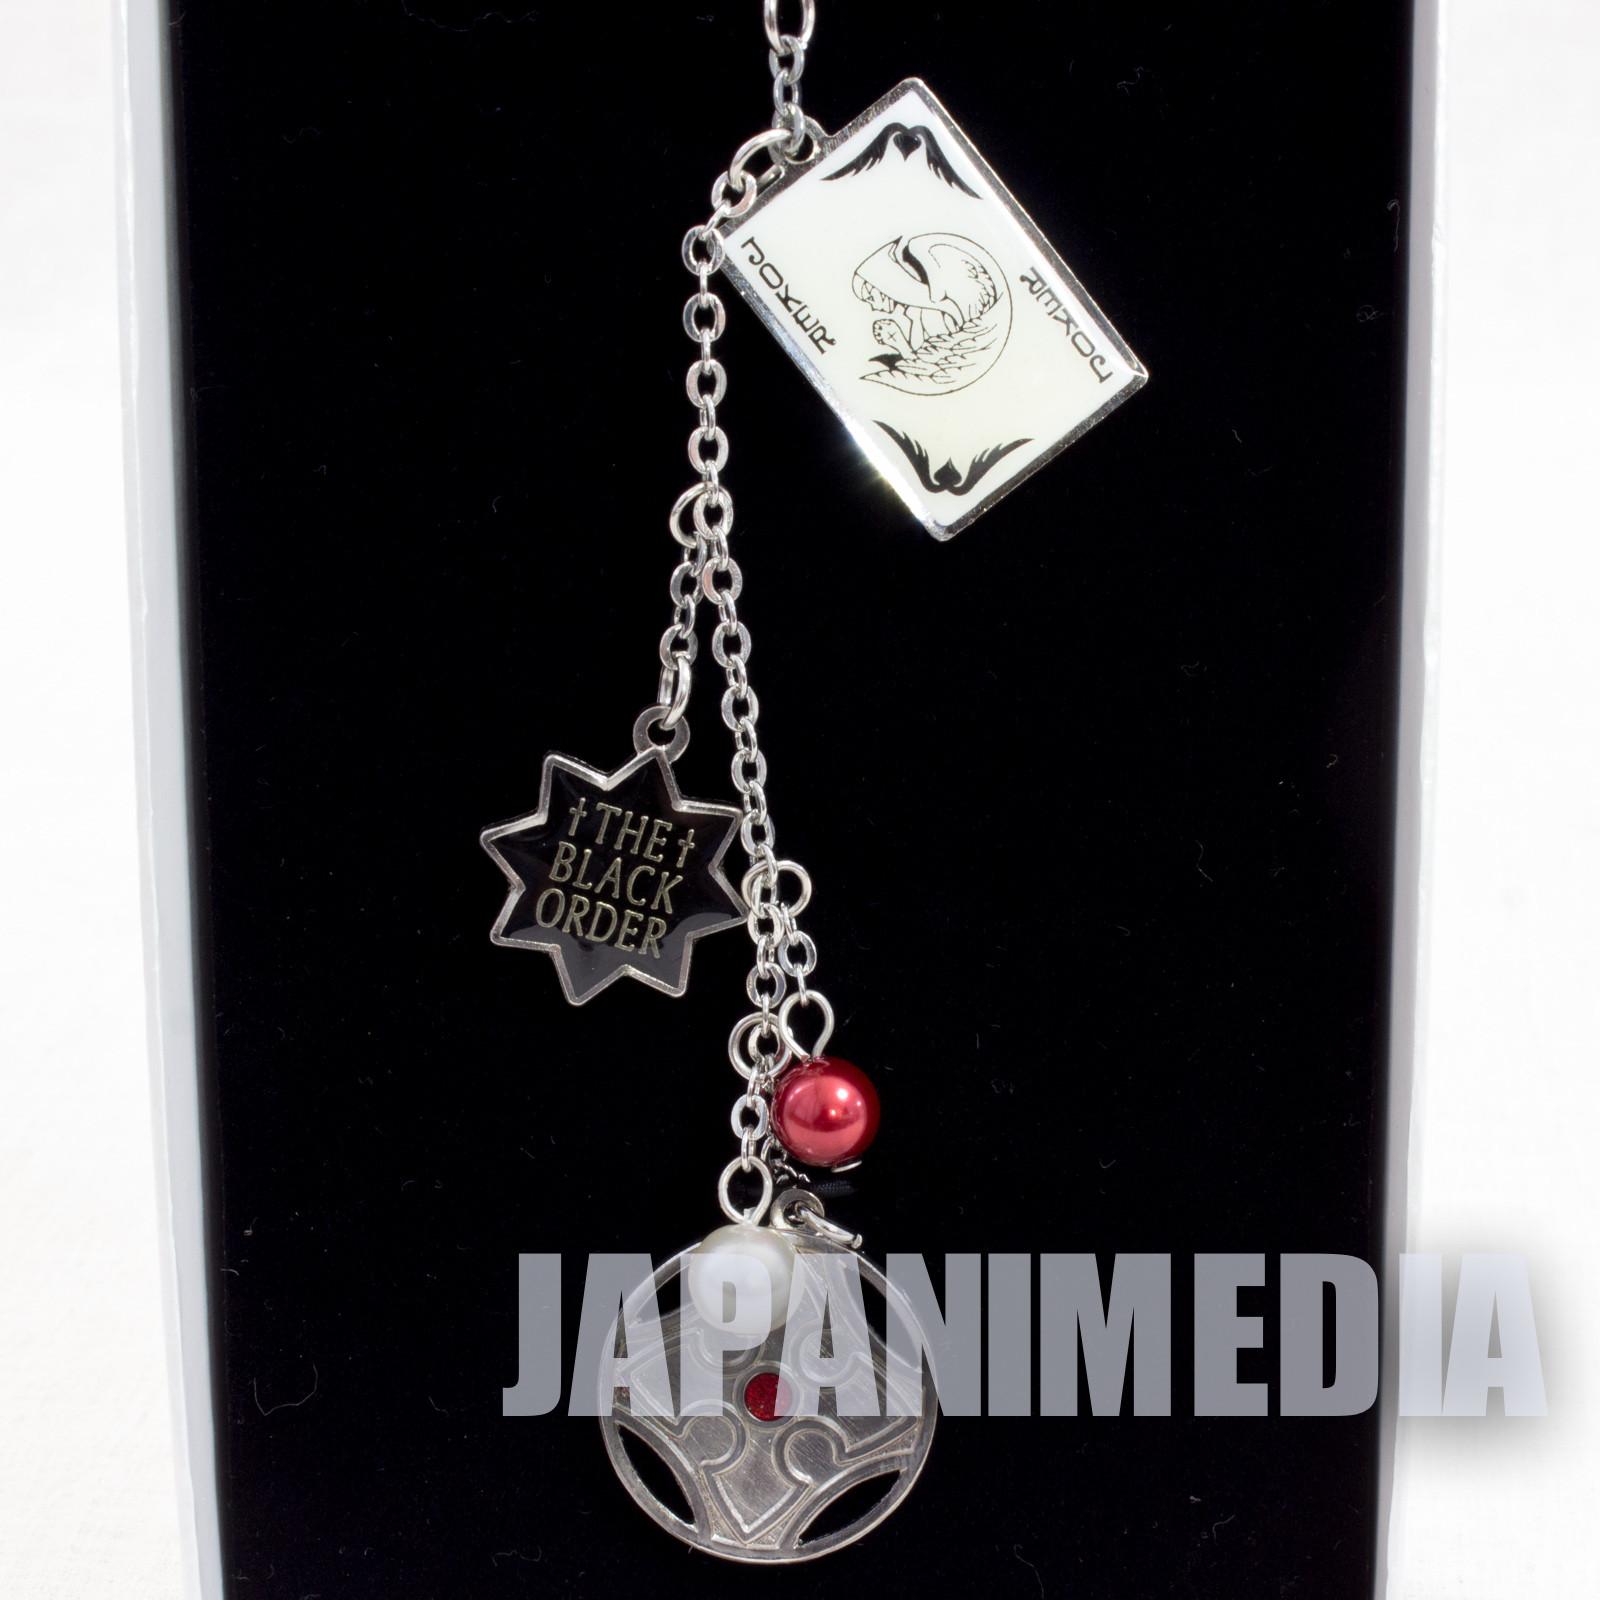 RARE! D.Gray-man The Black Order Bag charm Keychain [A] JAPAN ANIME